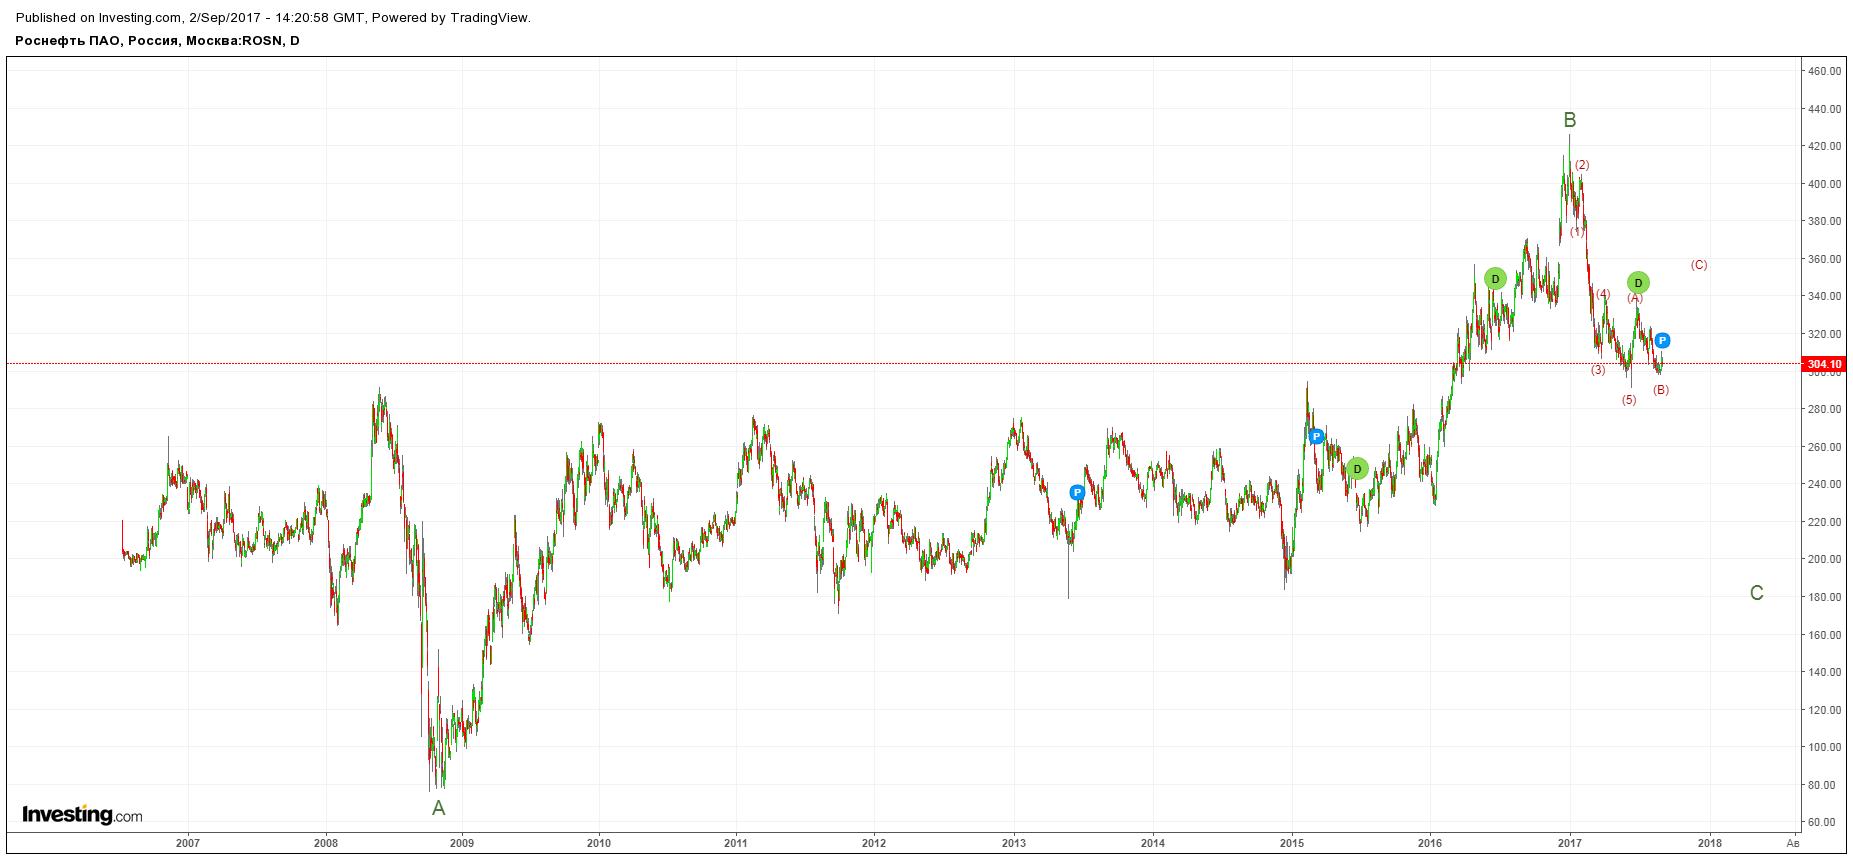 Волновой анализ акций Роснефти